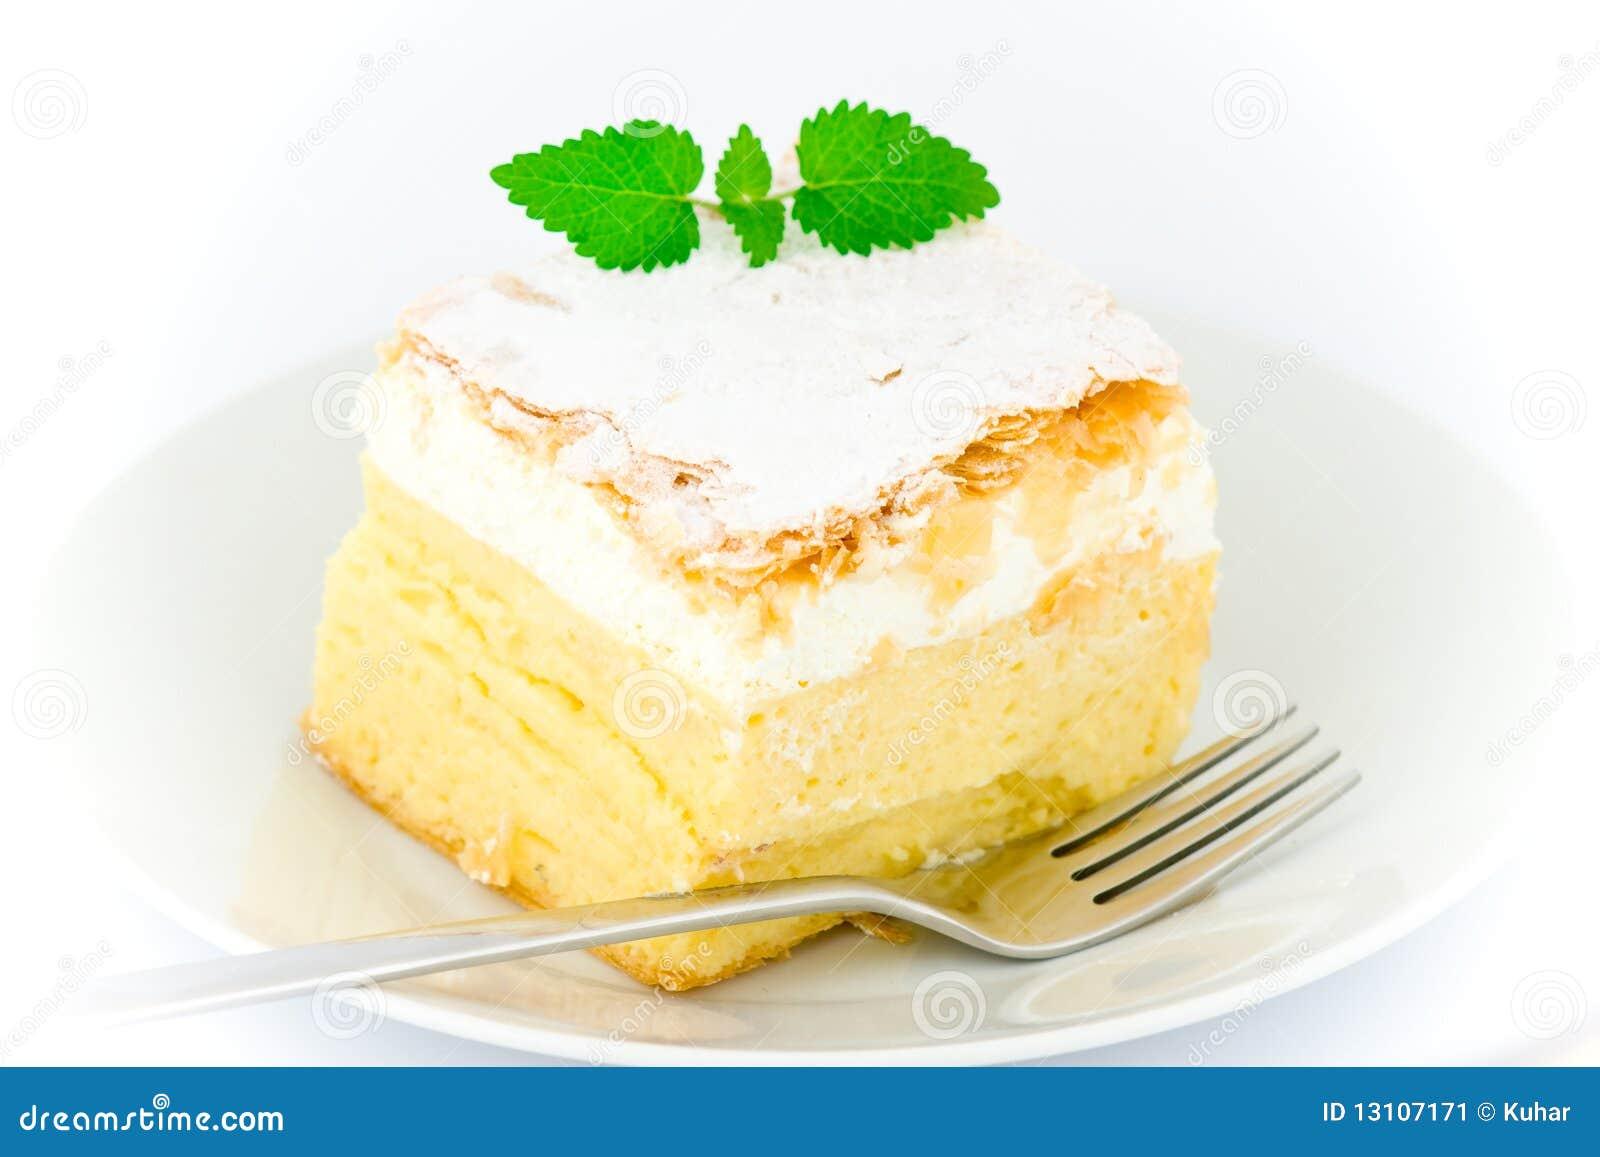 pastry cream vs custard